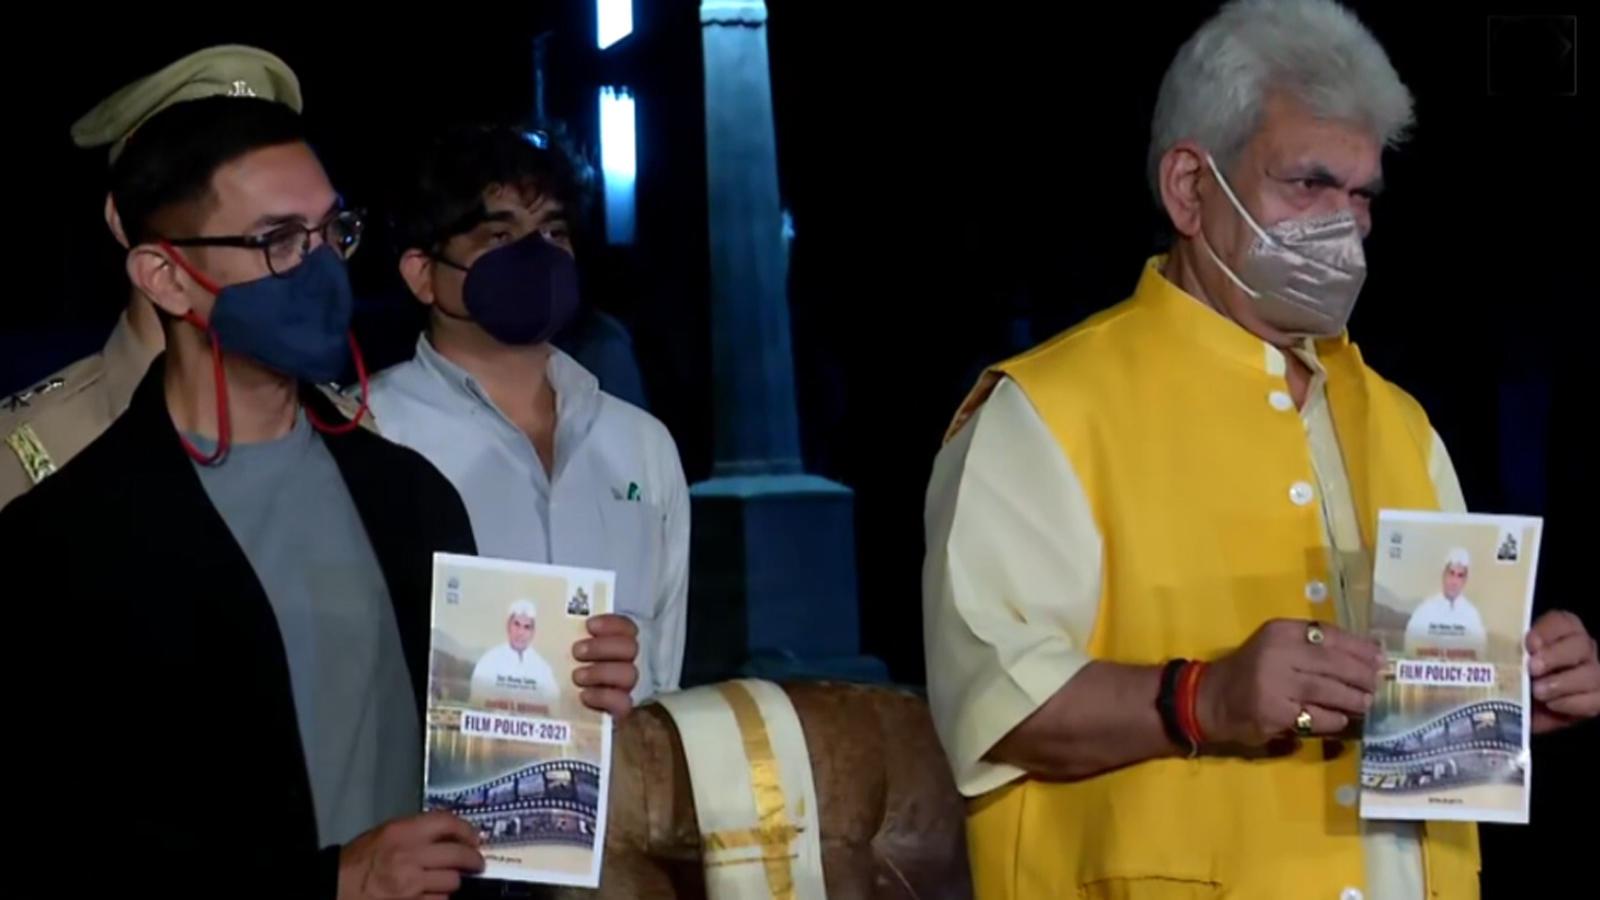 aamir-khan-rajkumar-hirani-and-mahaveer-jain-join-jk-lg-manoj-sinha-for-the-launch-of-new-film-policy